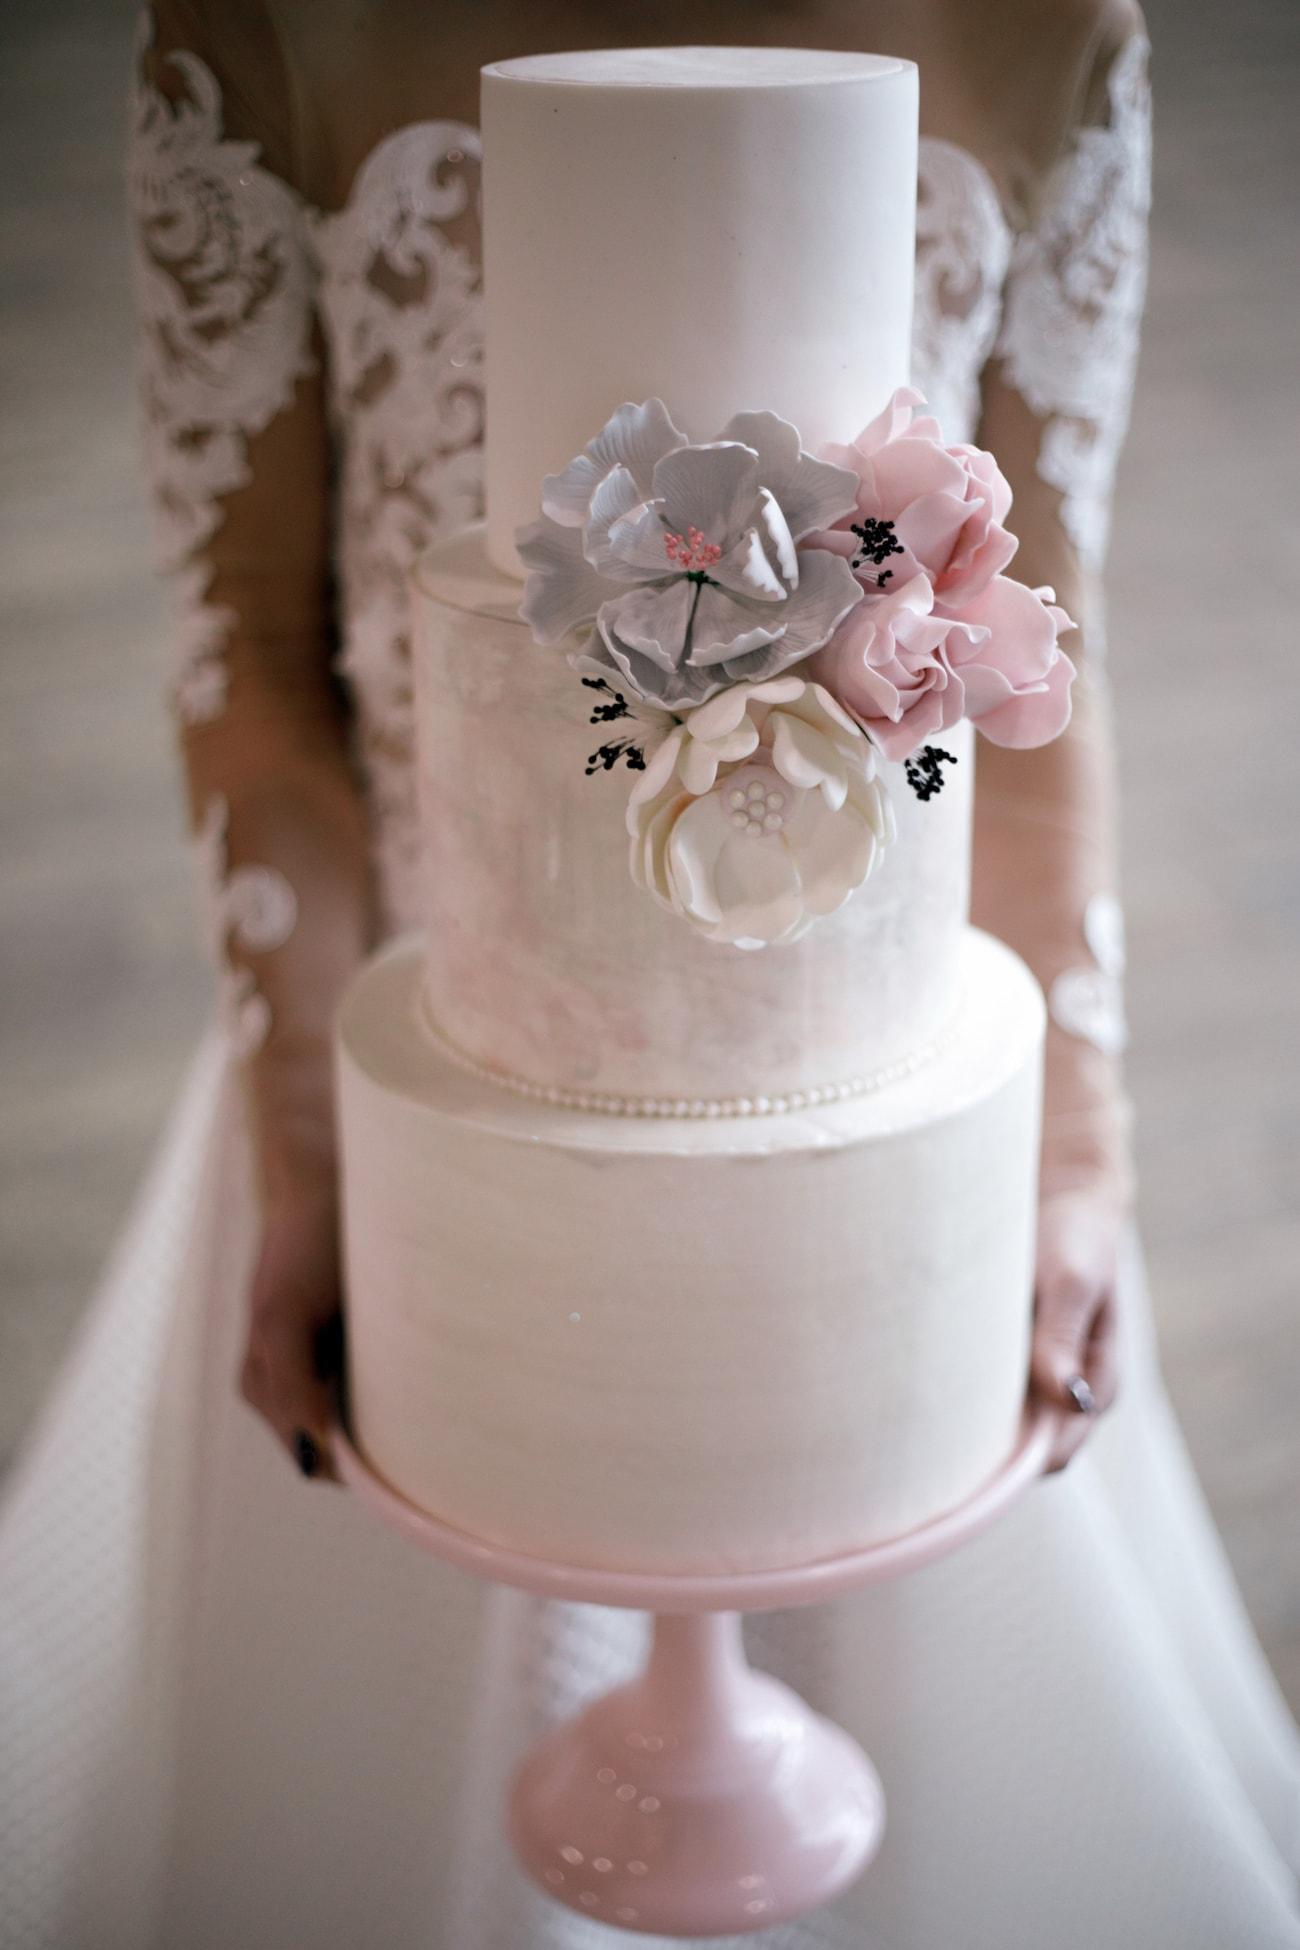 Pastel Wedding Cake with Sugar Flowers | Credit: Jessica Notelo (30)